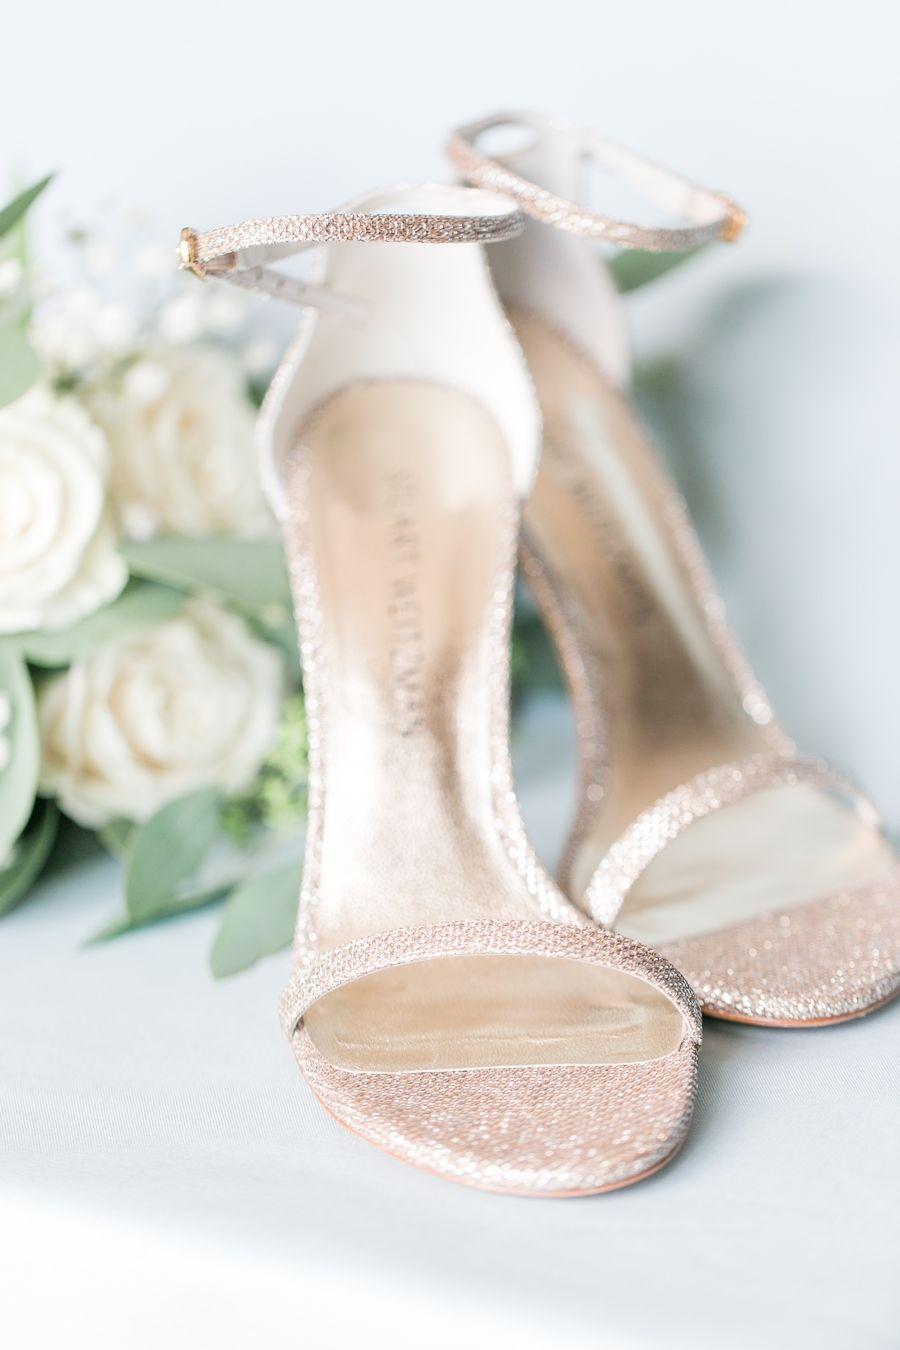 b027afa3014 This Wedding Needs No Fixin  Up... It s Downright Joanna Gaines ...